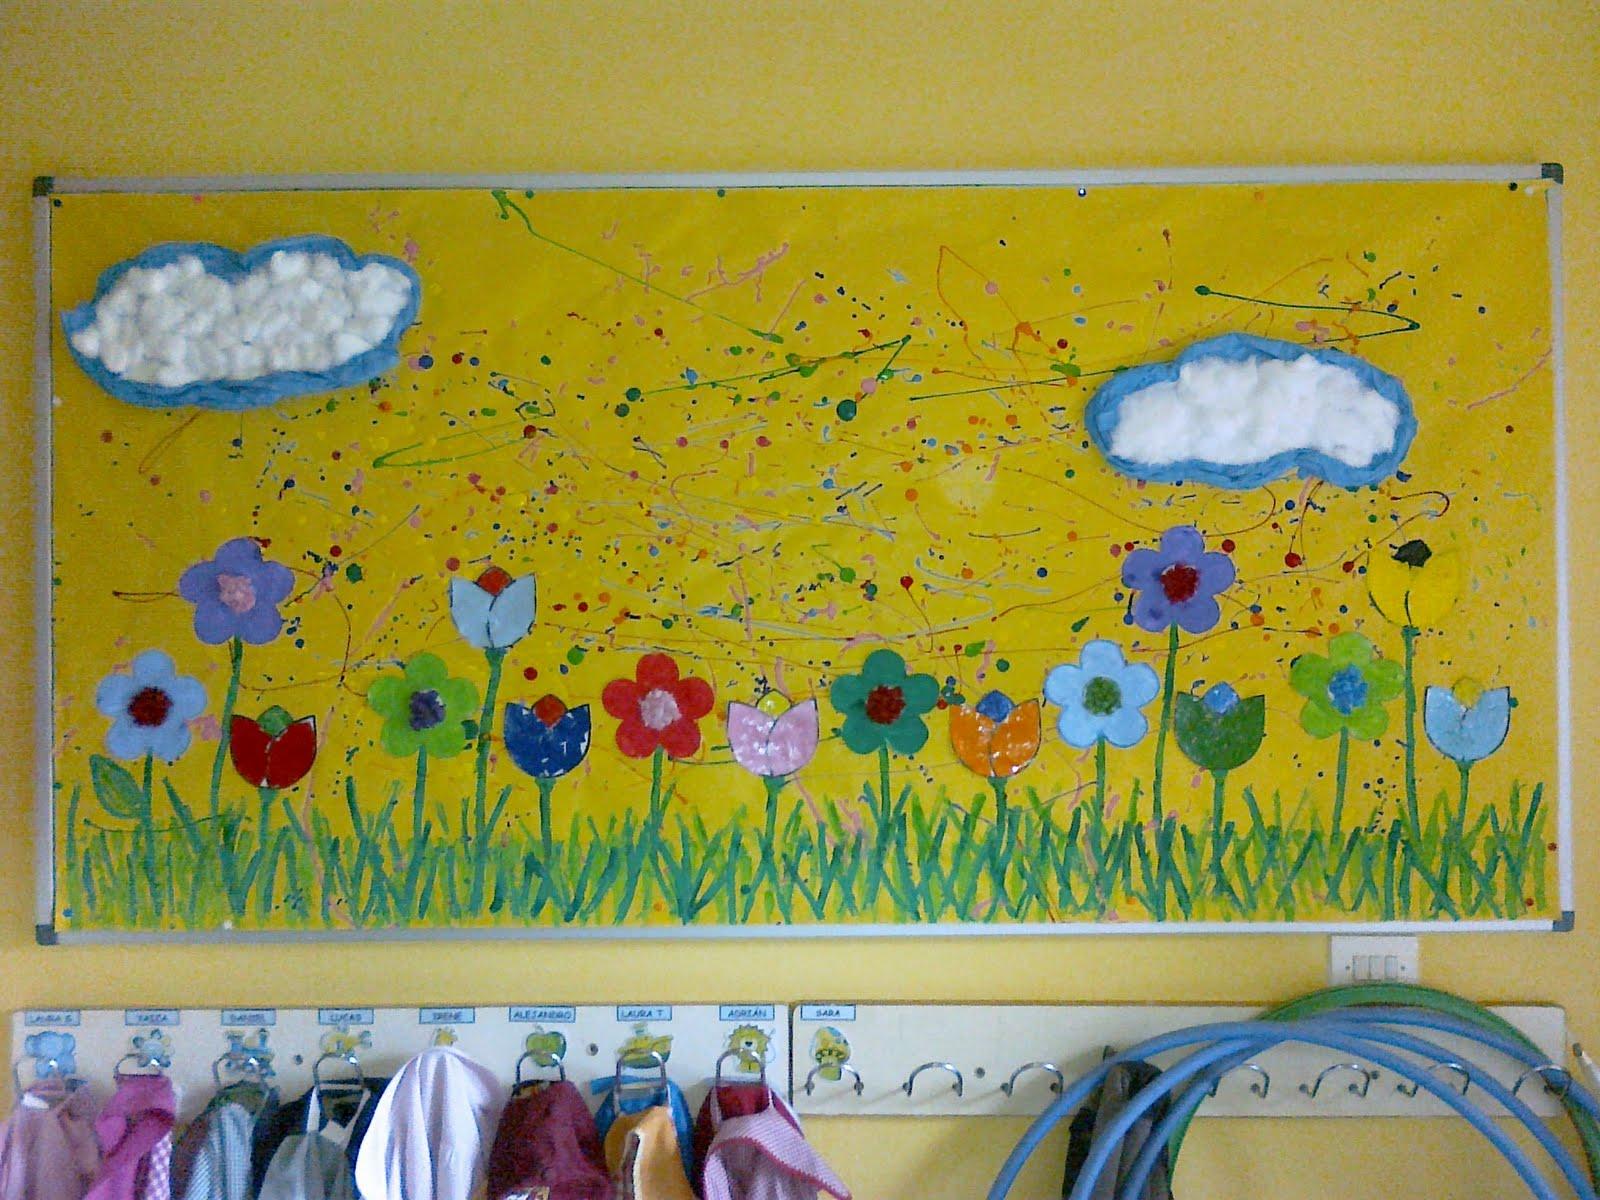 Peri dico mural primavera educaci n preescolar la revista for Avisos de ocasion el mural